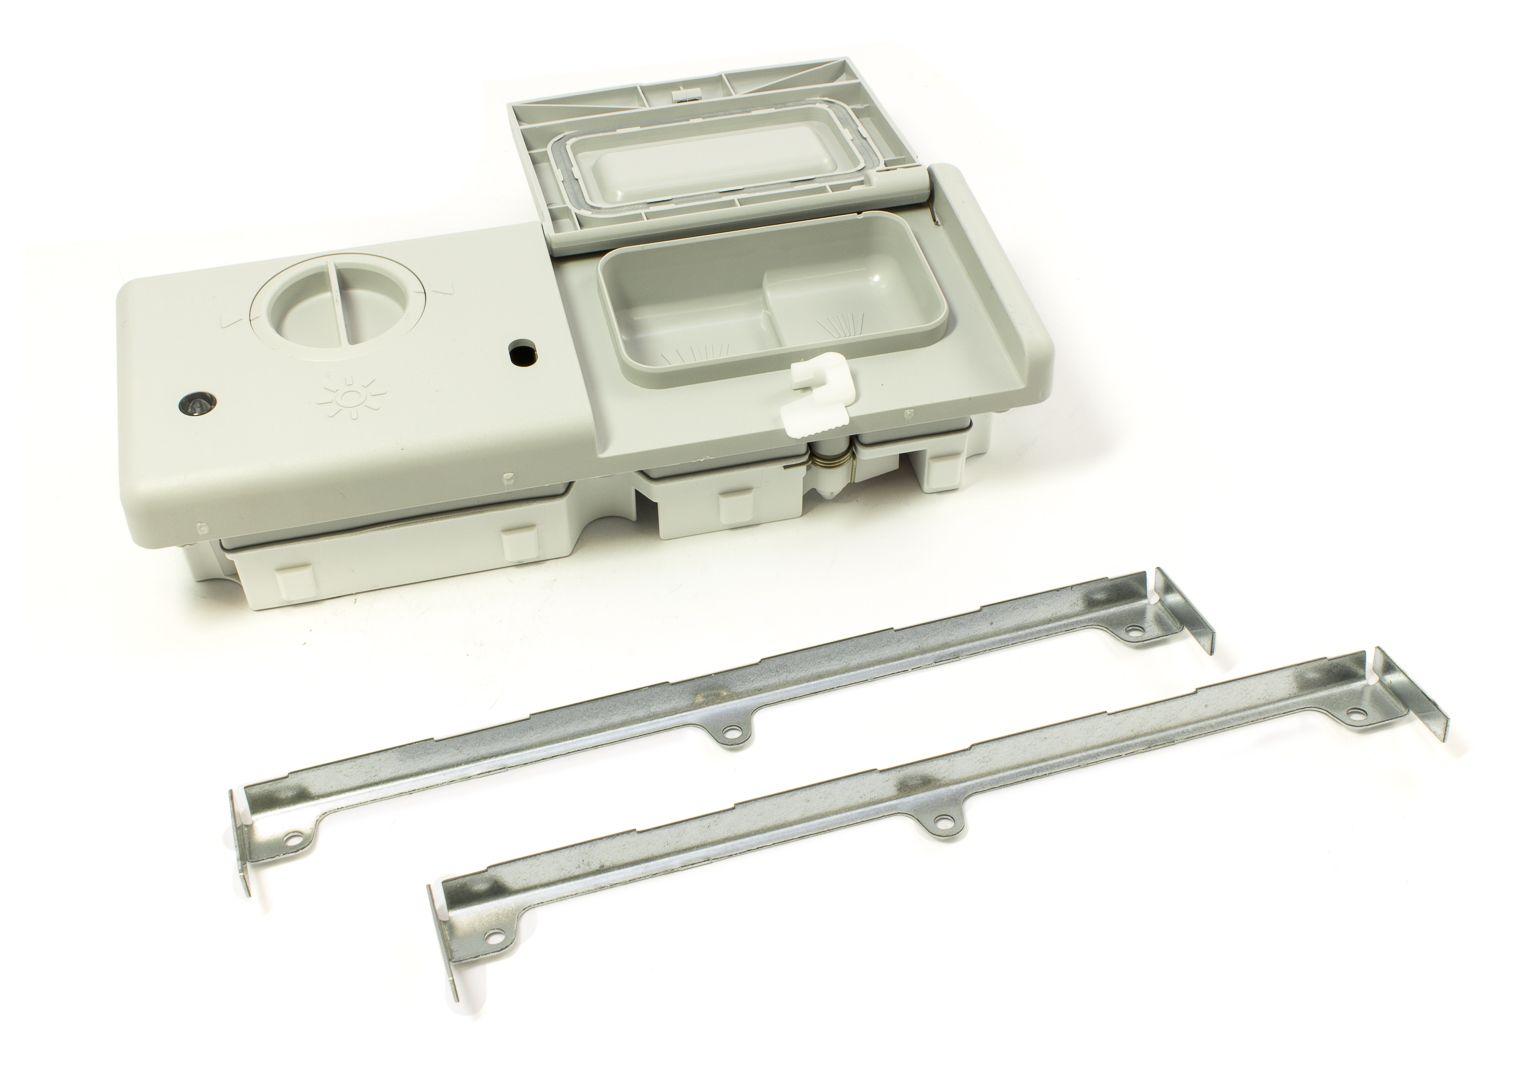 násypka do myček Indesit Ariston Ardo Smeg s termoaktuátorem - C00104789 Whirlpool / Indesit